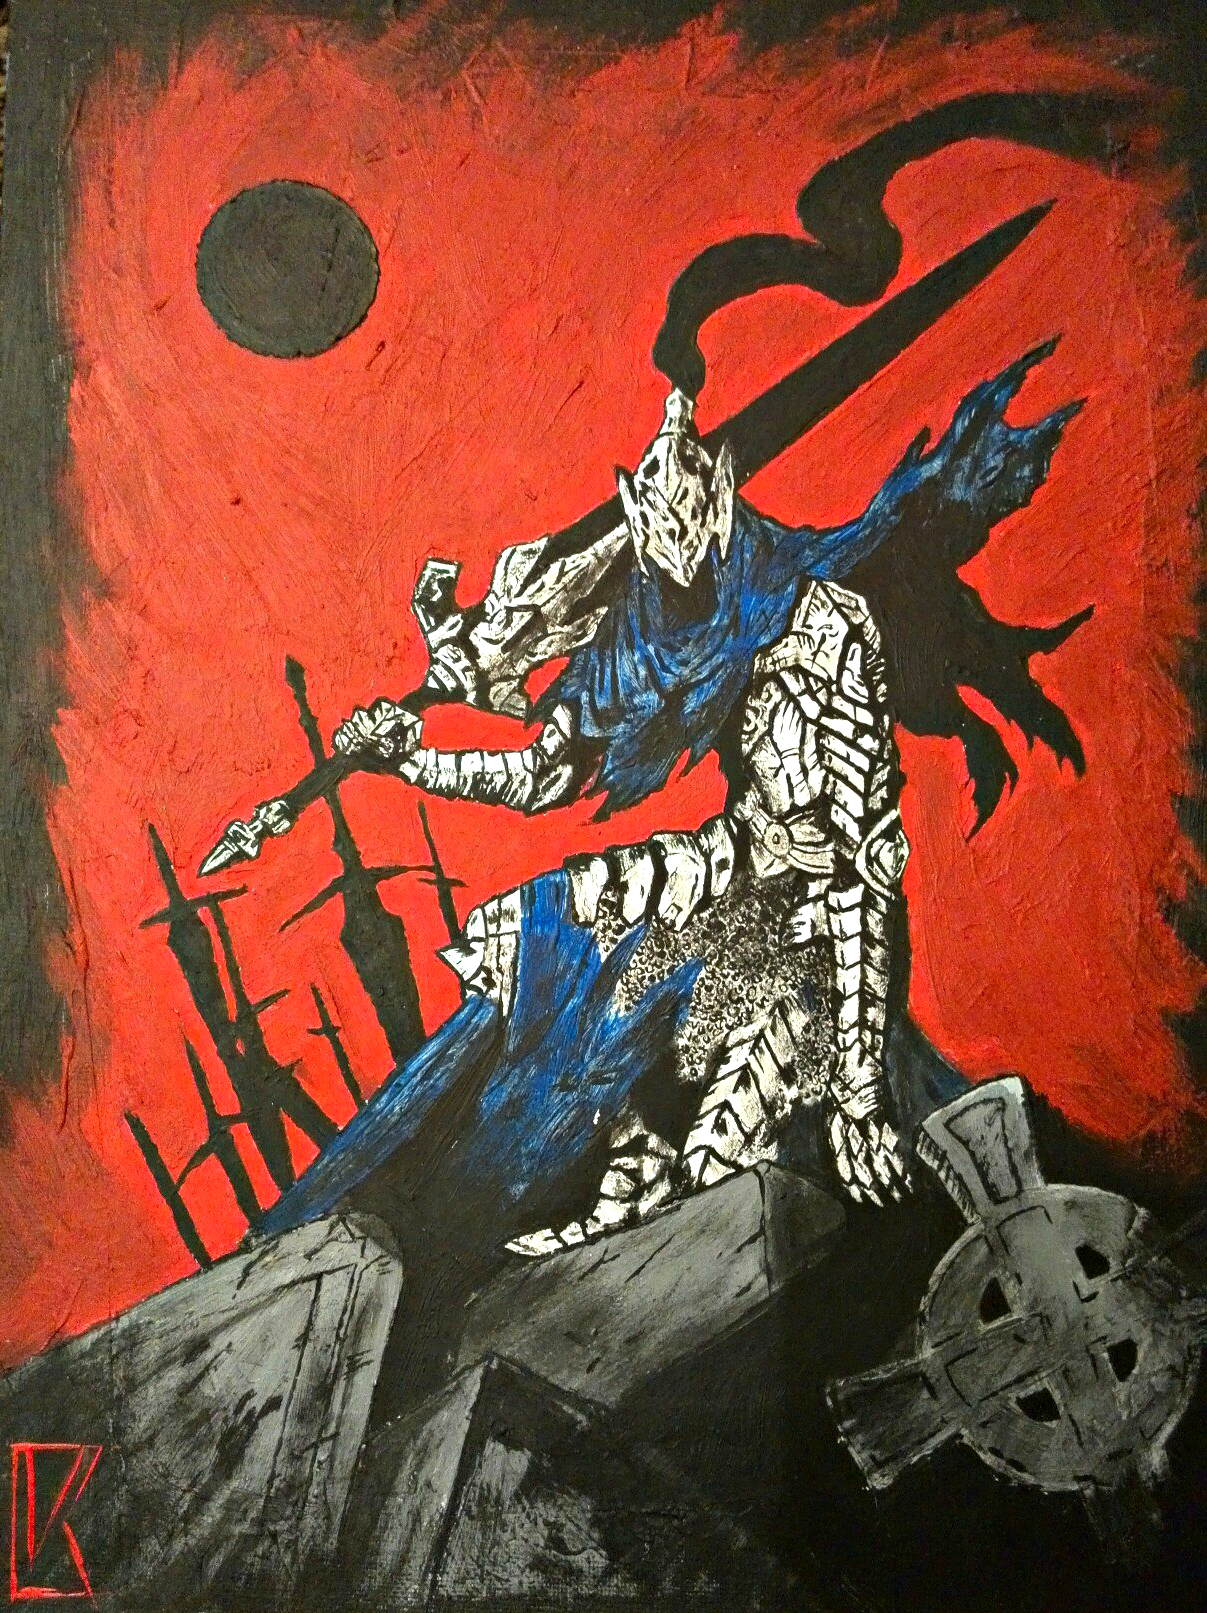 ART - Artorias the Abysswalker - Изображение 1